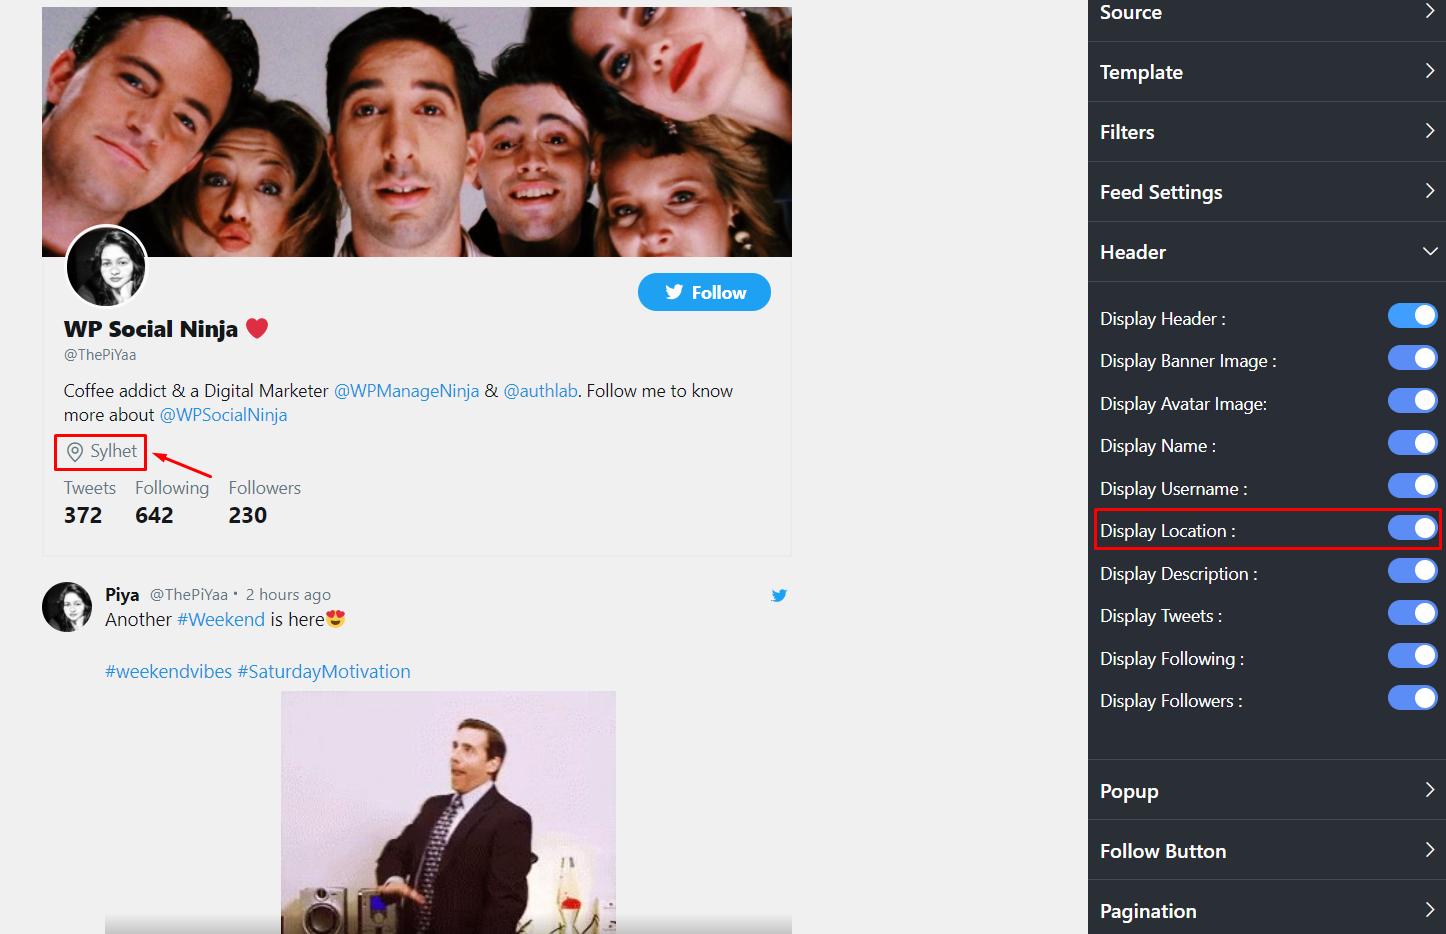 Twitter settings display location